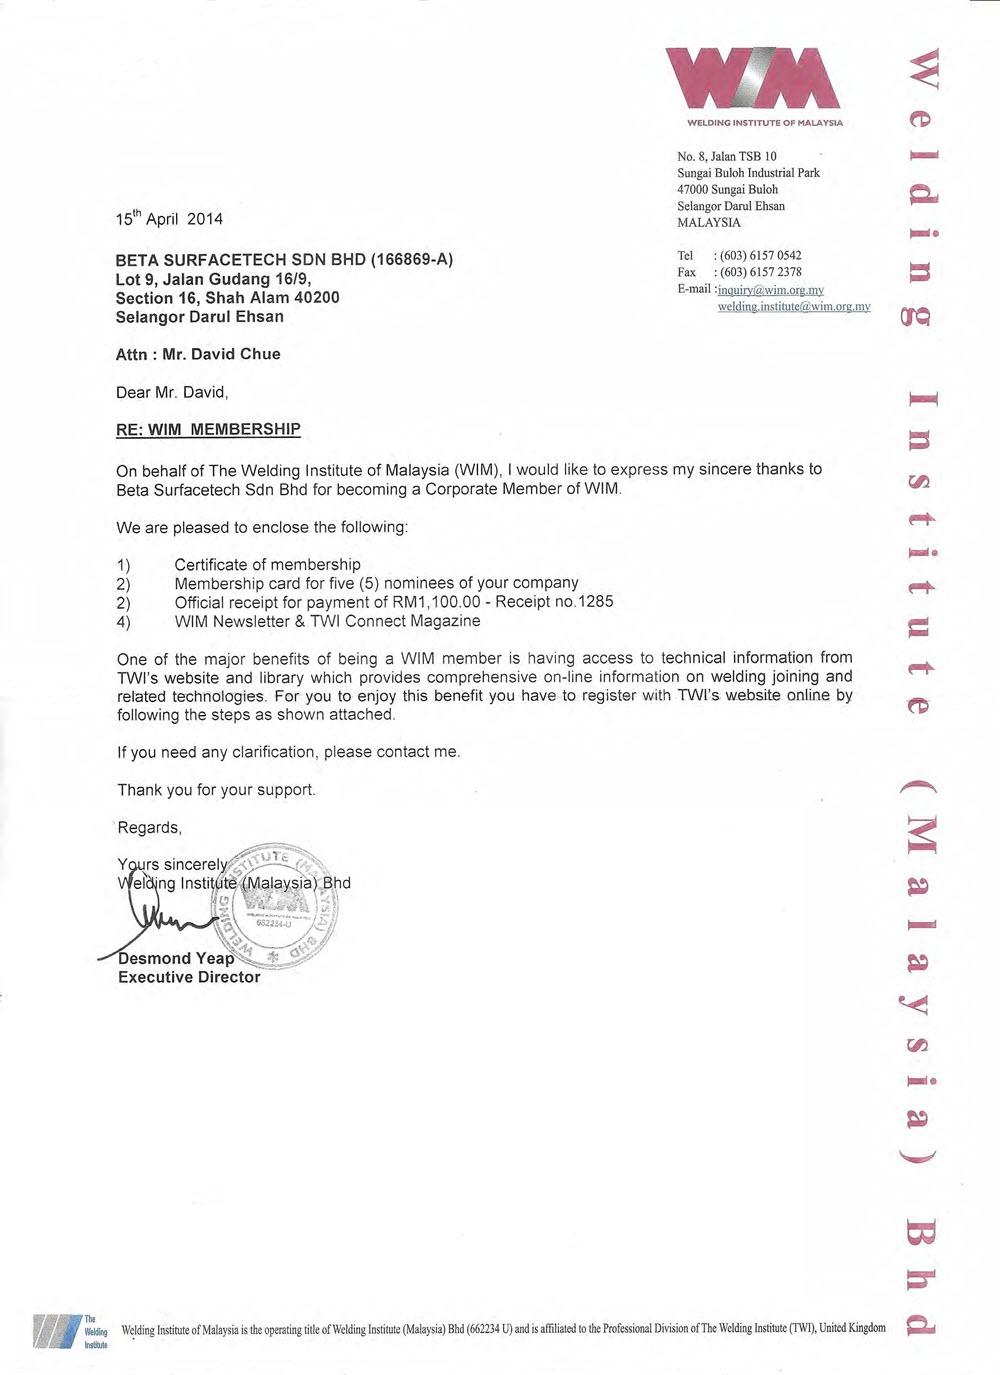 WorkArchievements-Certification&Awards-WIMCert